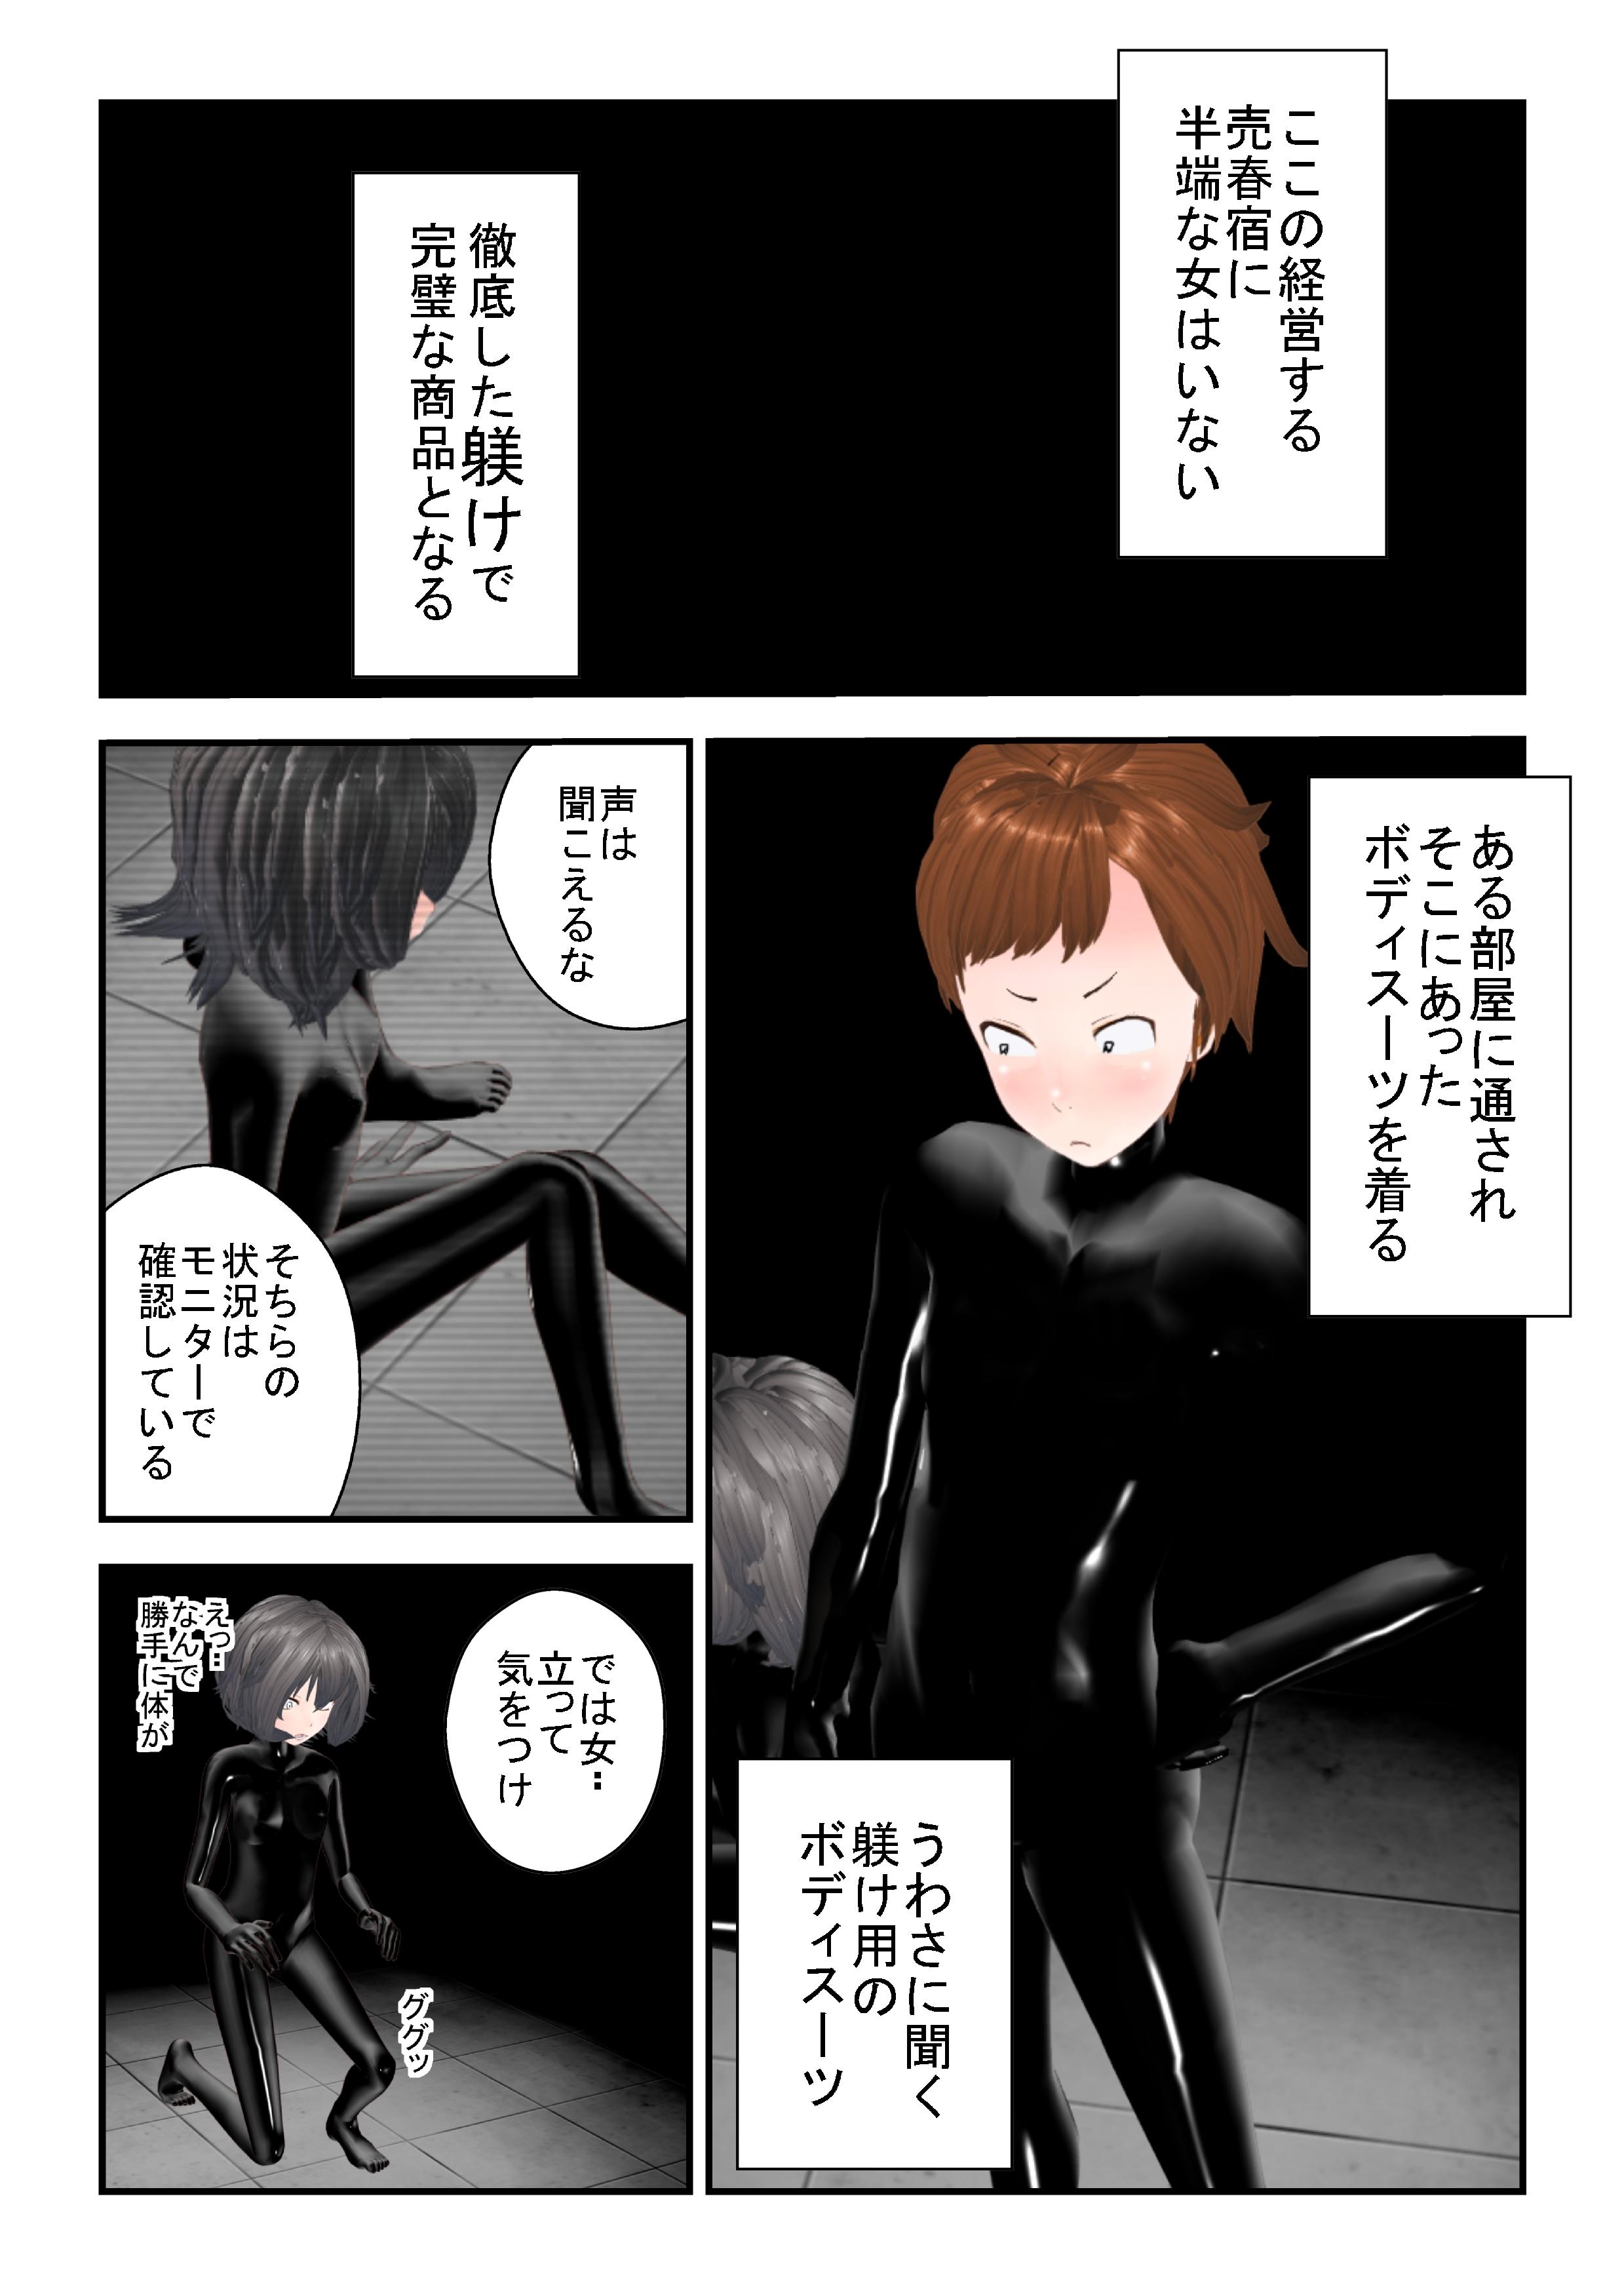 shi_0002.jpg